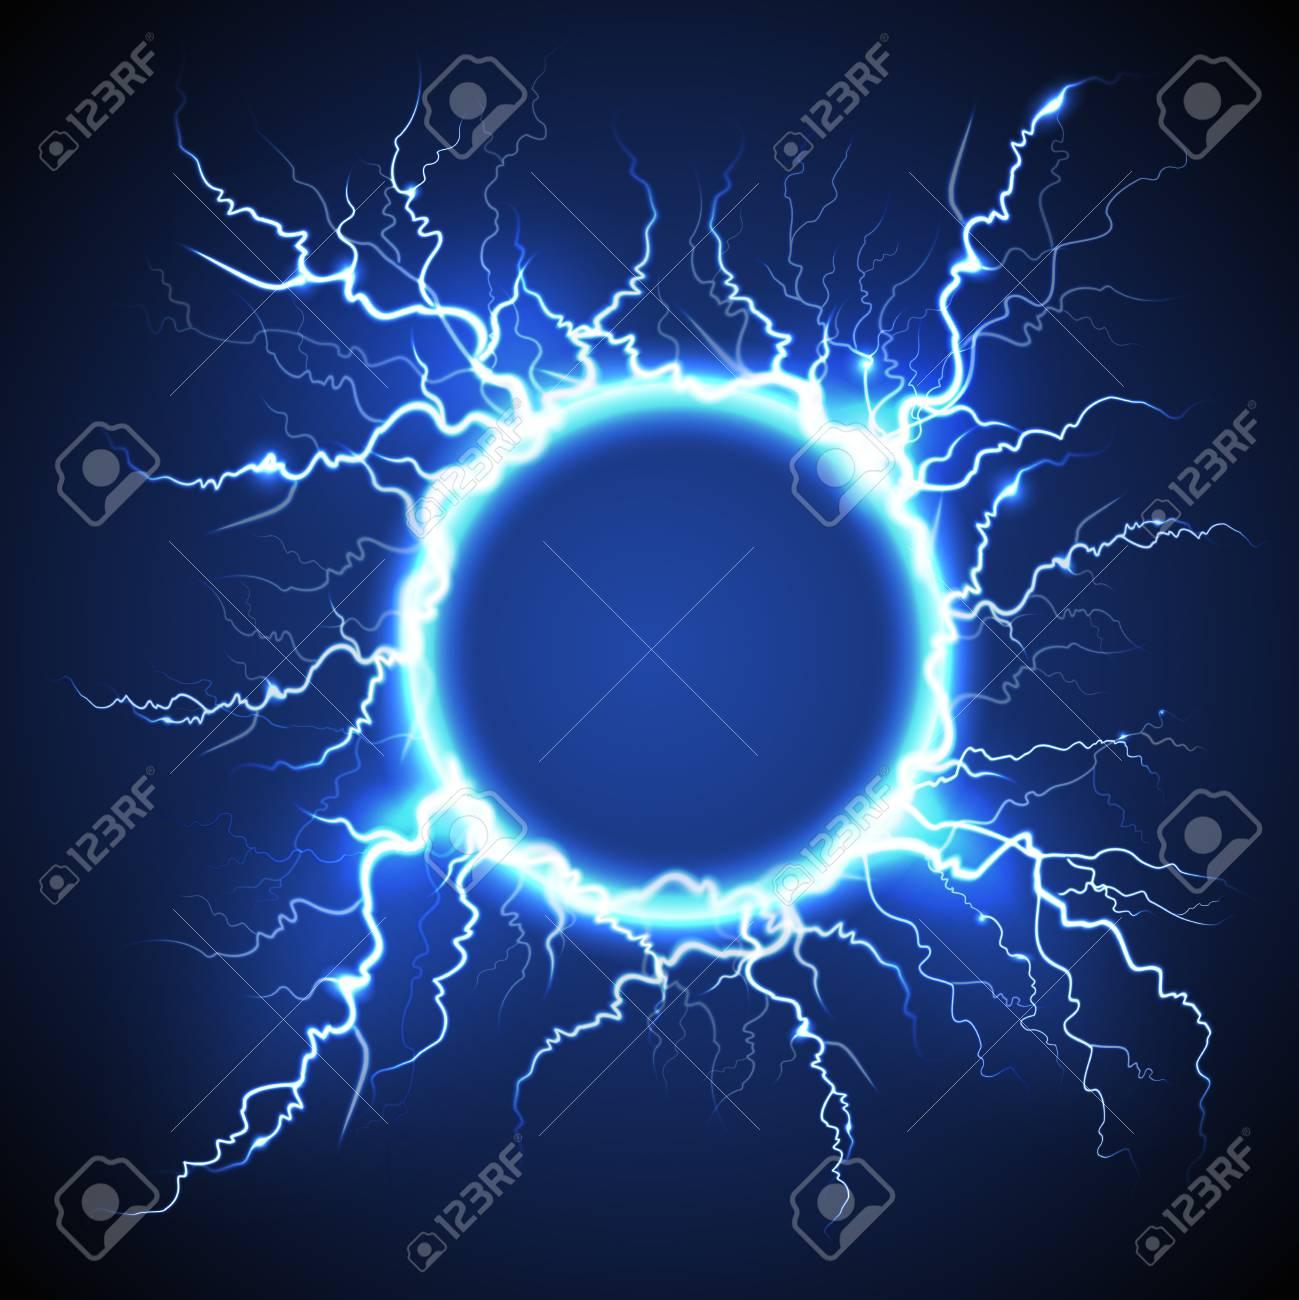 Luminous electric circle lightning atmospheric phenomenon realistic image on dark night sky blue decorative background vector illustration - 88540352